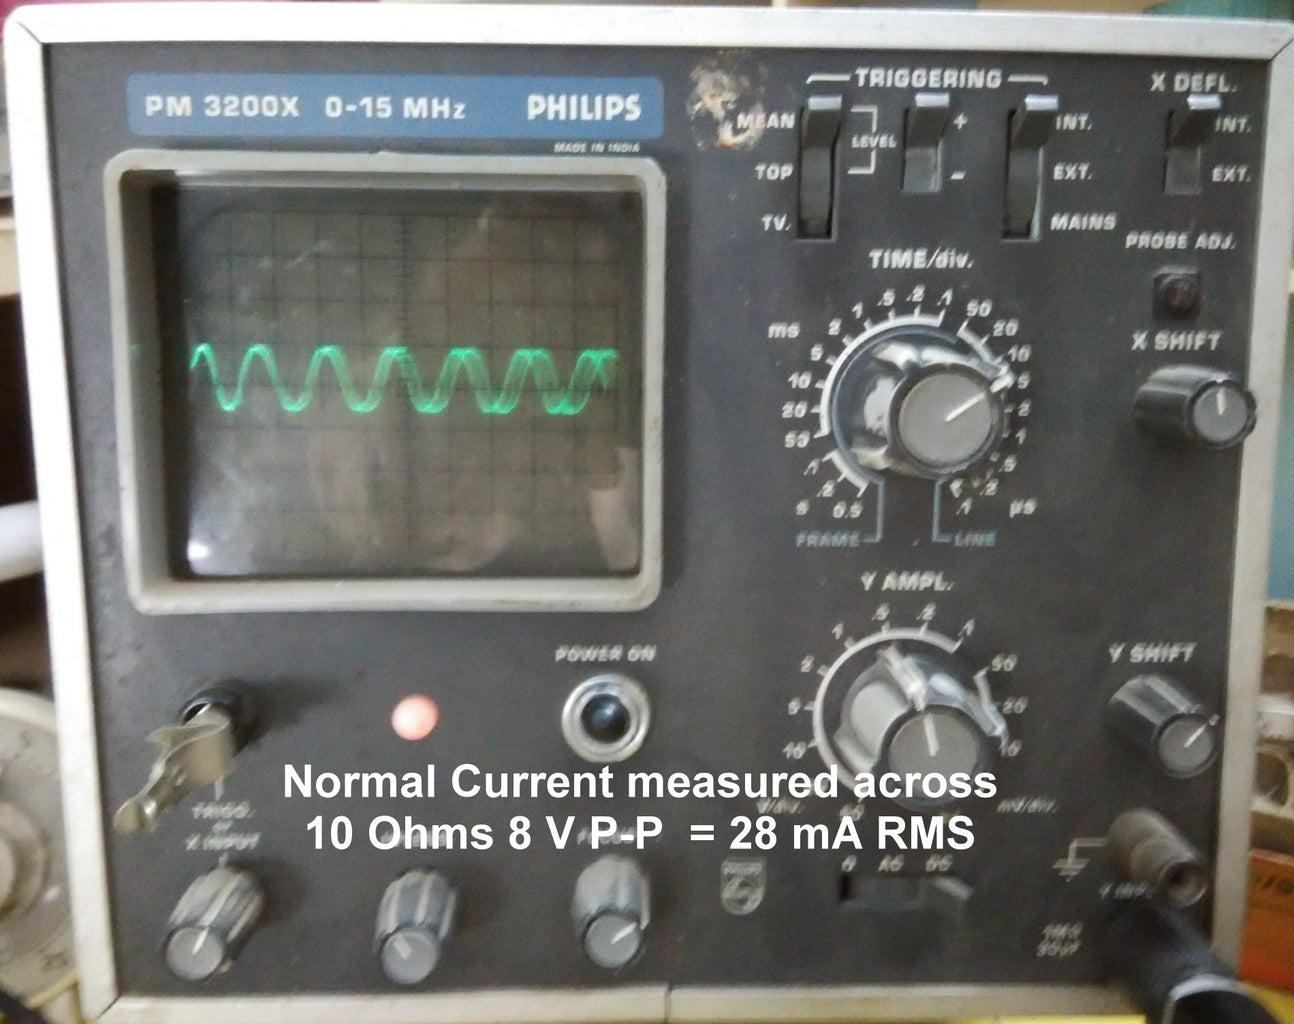 Experimental Measurement Data